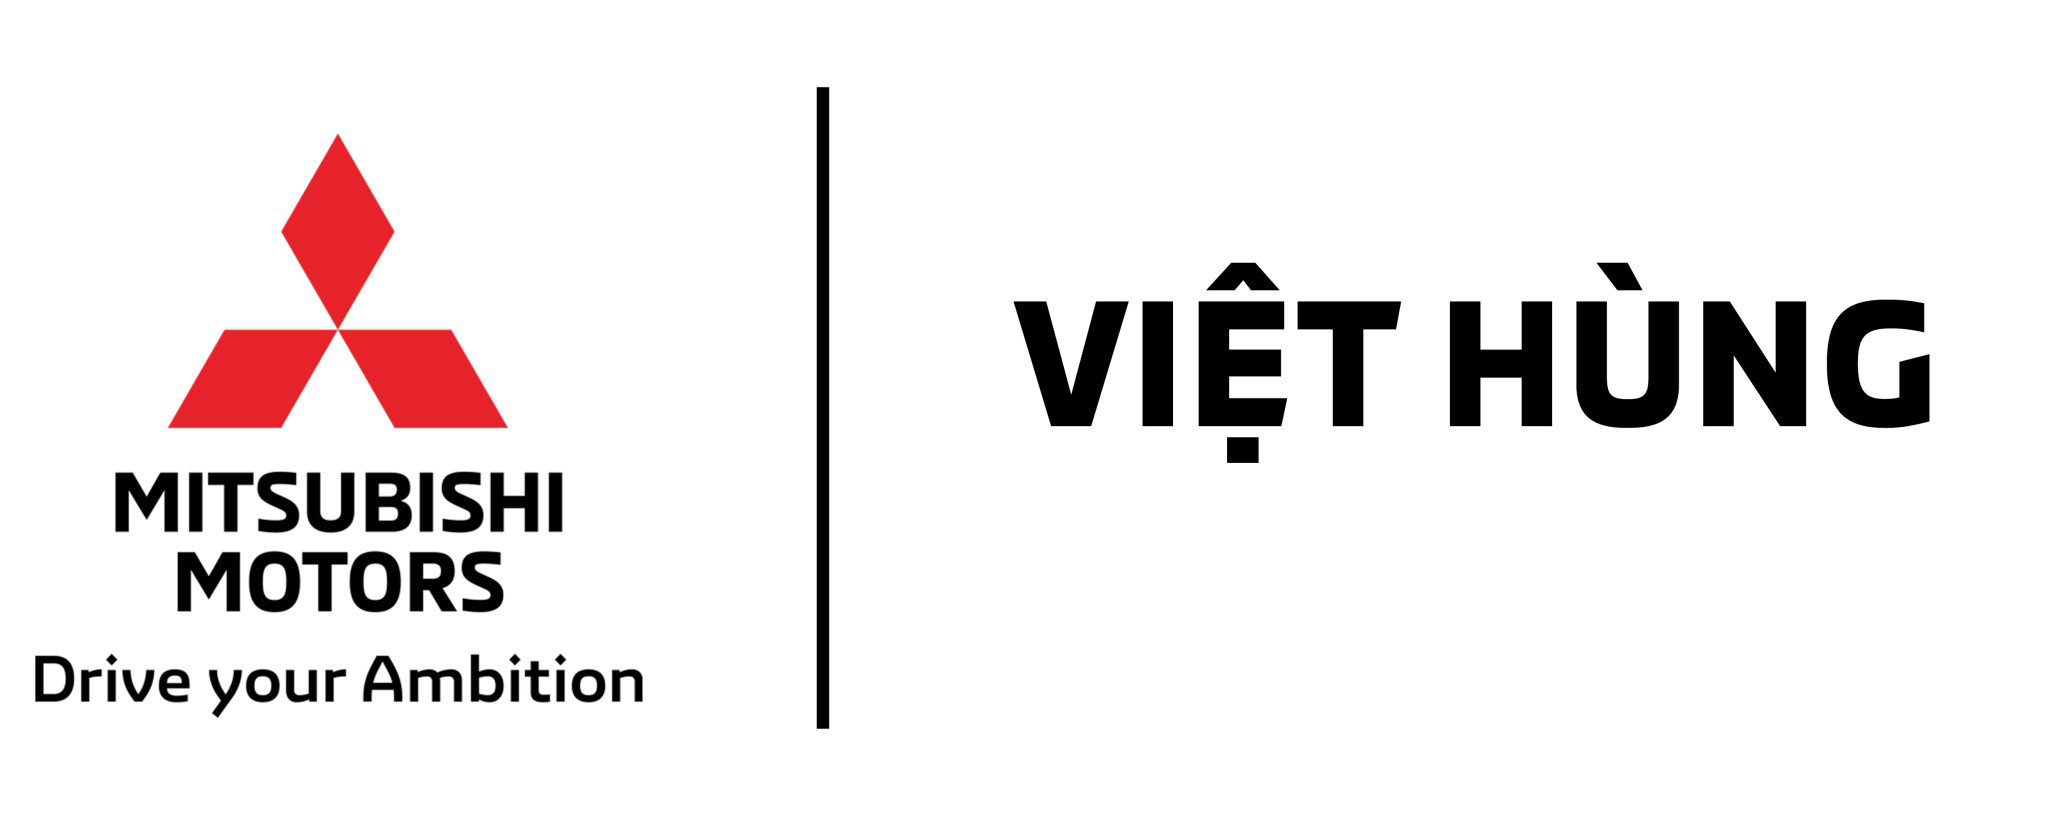 Mitsubishi Motors Việt Hùng